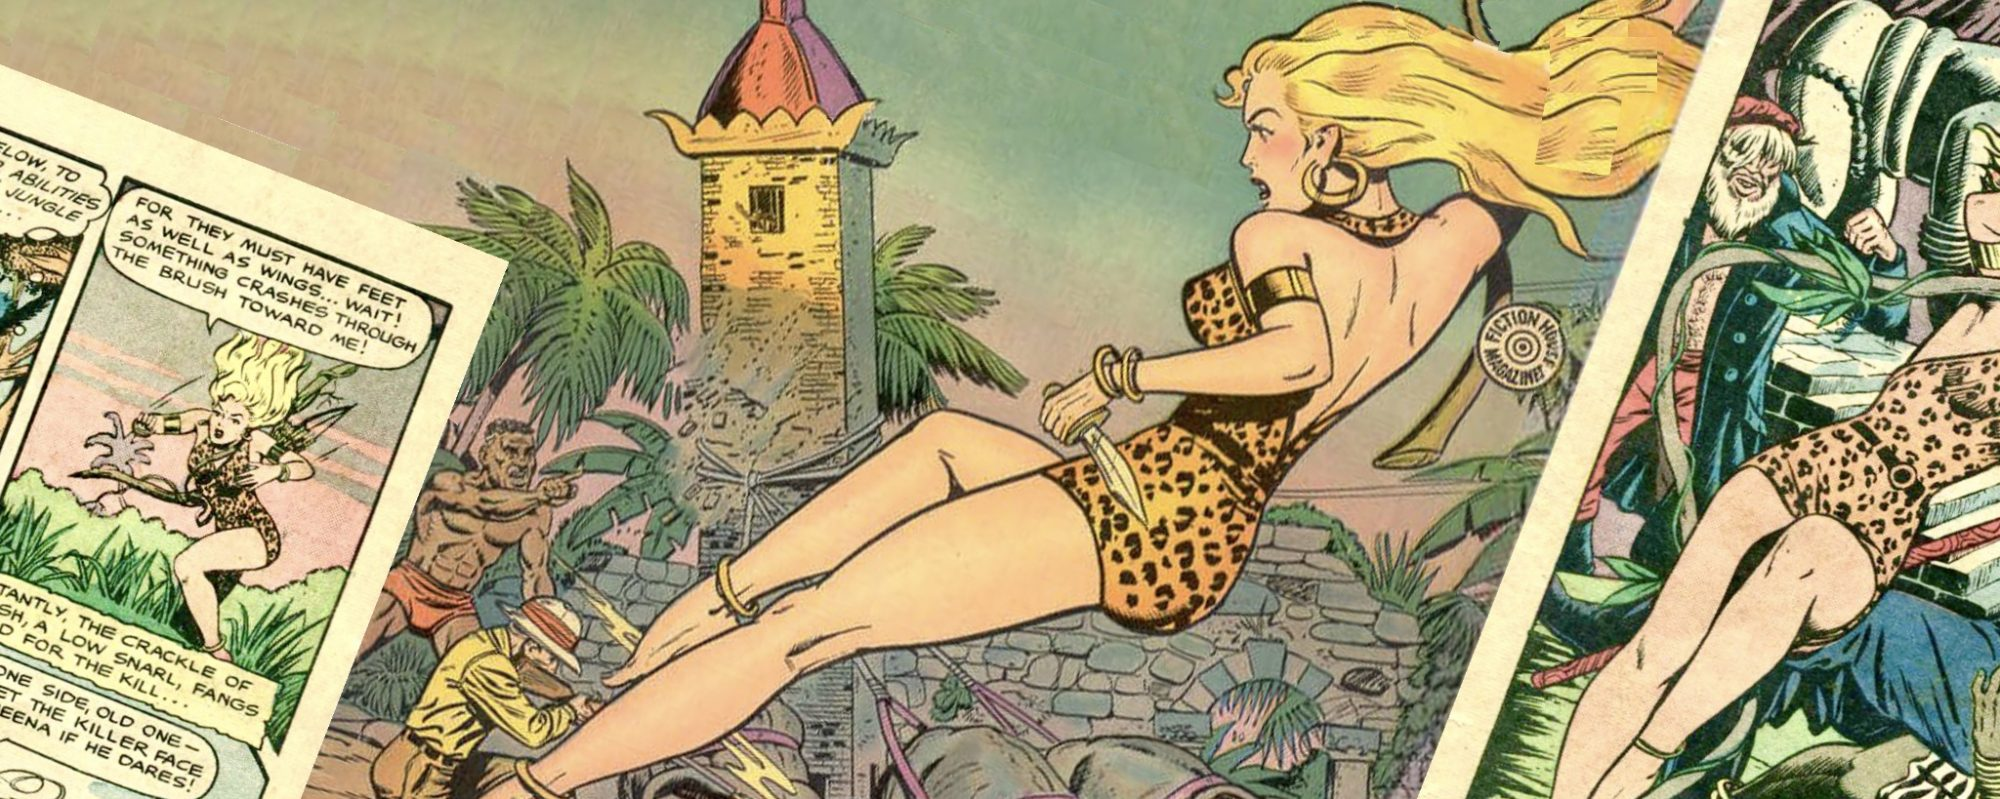 Sheena, Queen of the Jungle.